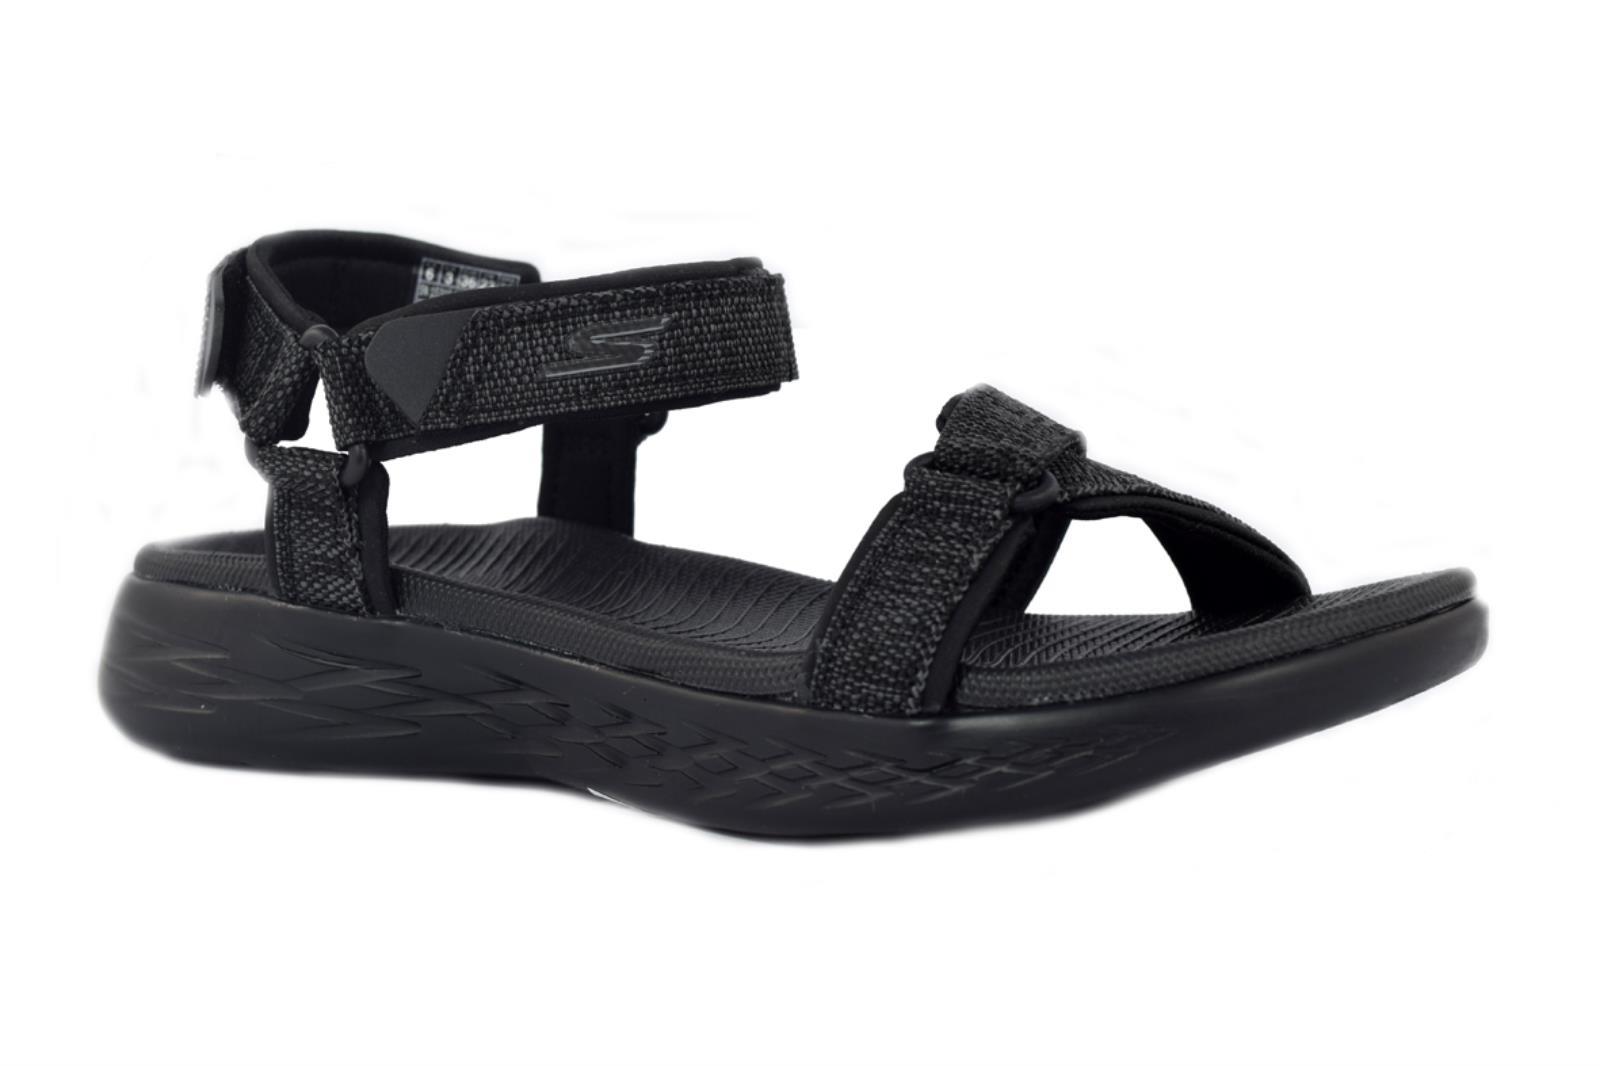 Skechers ON THE GO 600 Radiant Sandali Donna Black 15315BBK | eBay